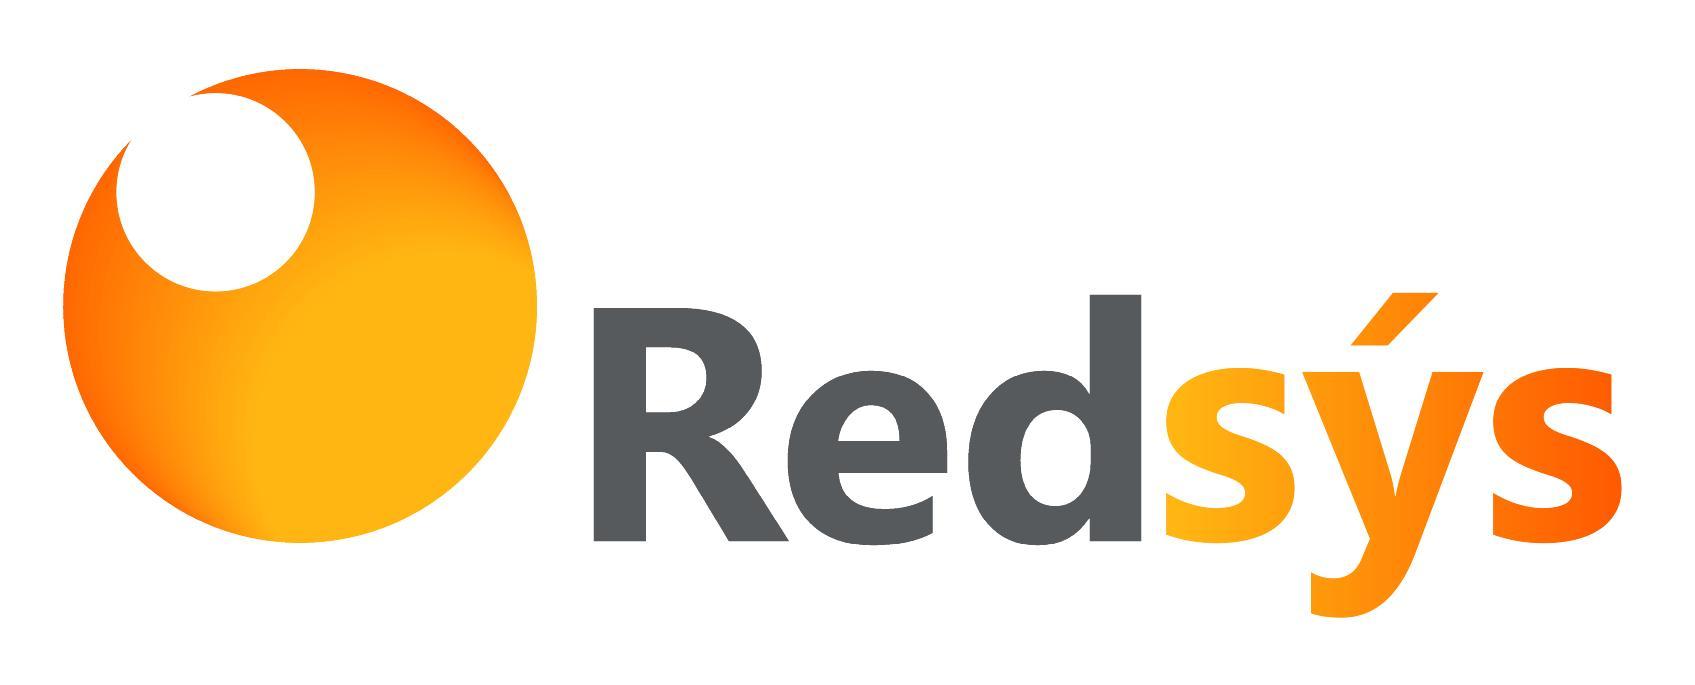 redsys pasarela de pago ecommerce tpv virtual